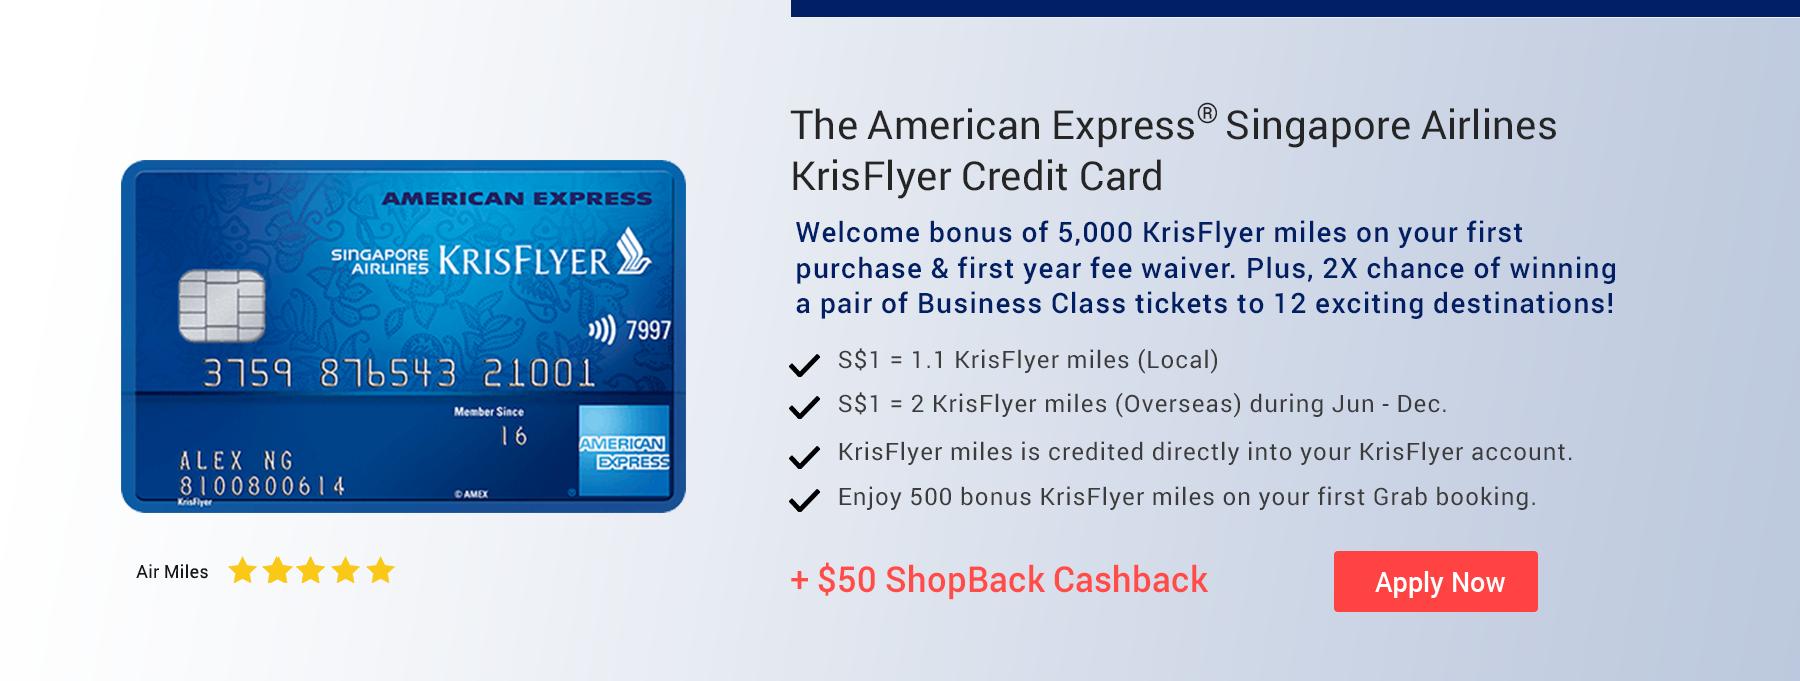 KrisFlyer Credit Card